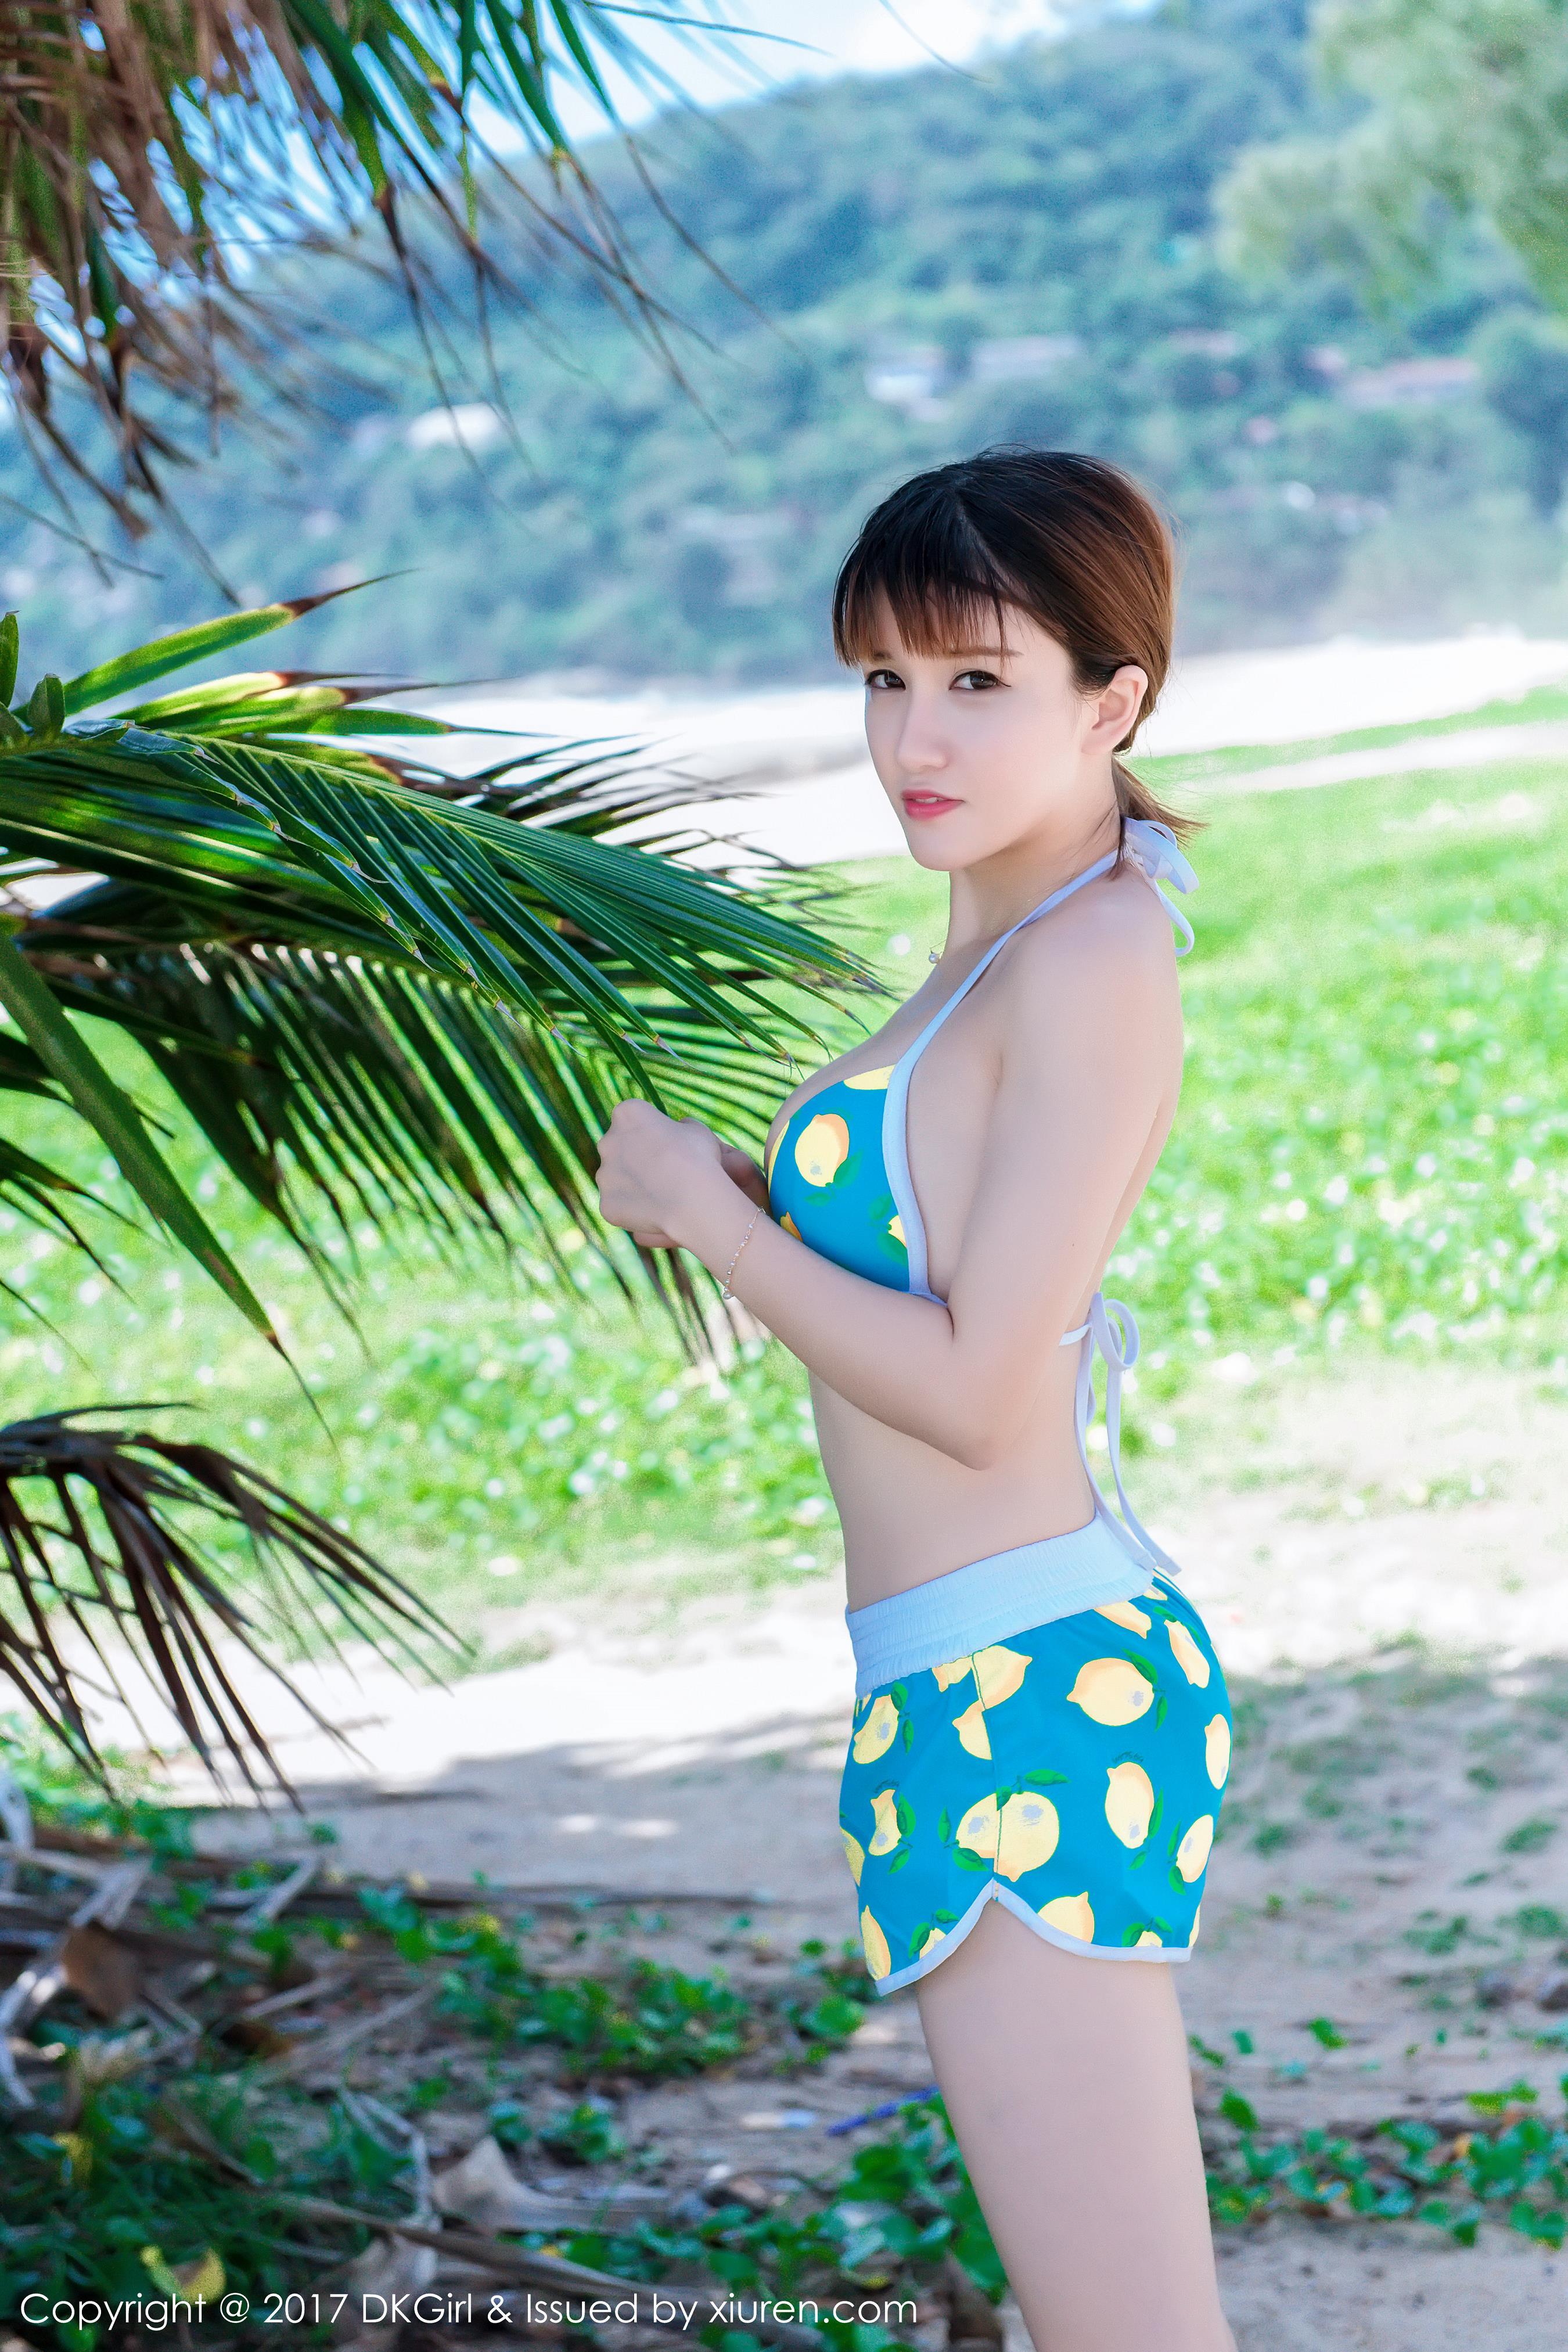 [DKGirl御女郎]DK20170210VOL0011 K8傲娇萌萌Vivian 童颜巨乳 性感比基尼泳装私房写真集